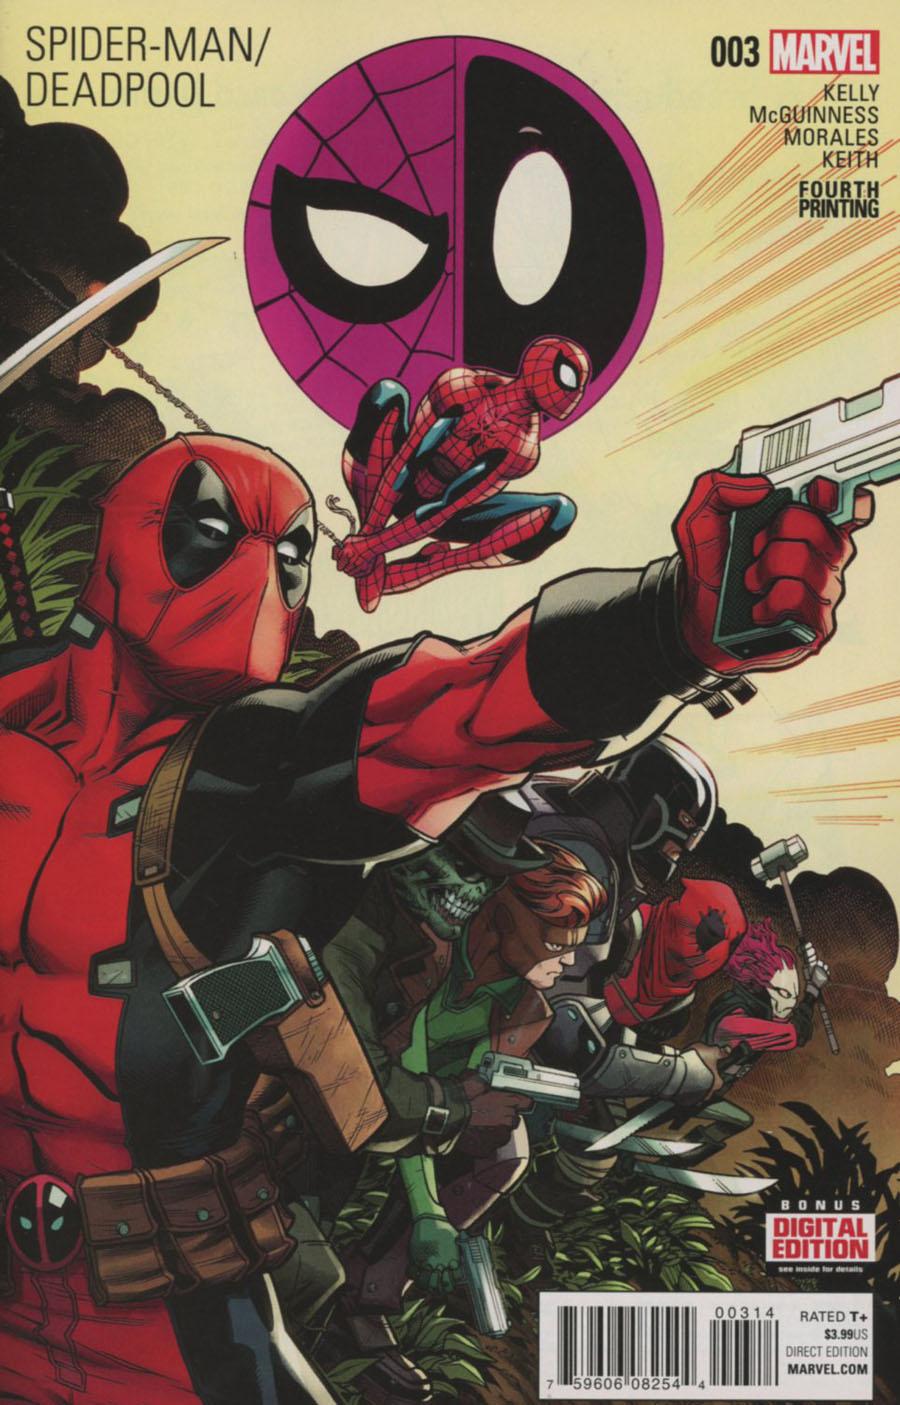 Spider-Man Deadpool #3 Cover E 4th Ptg Ed McGuinness Variant Cover